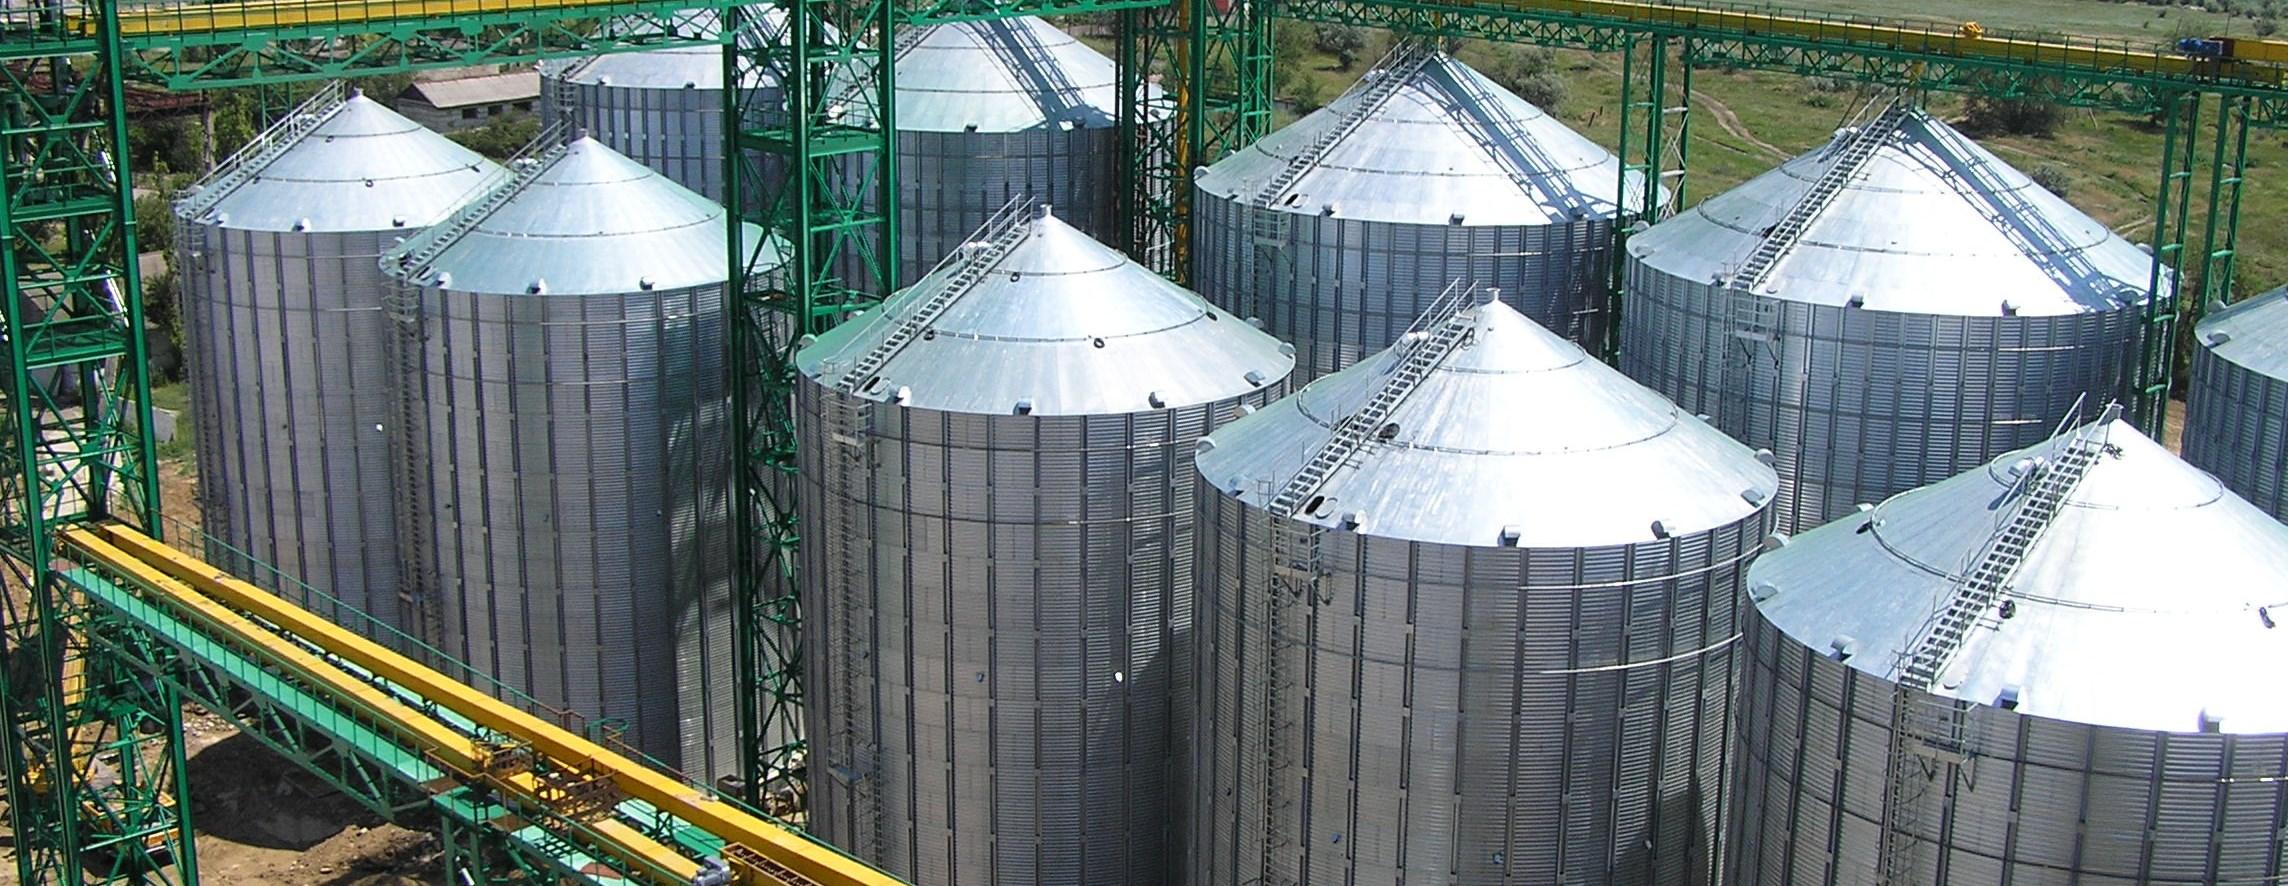 Ціни на зерно, соняшник, кукурудзу (на 10.03.2017)